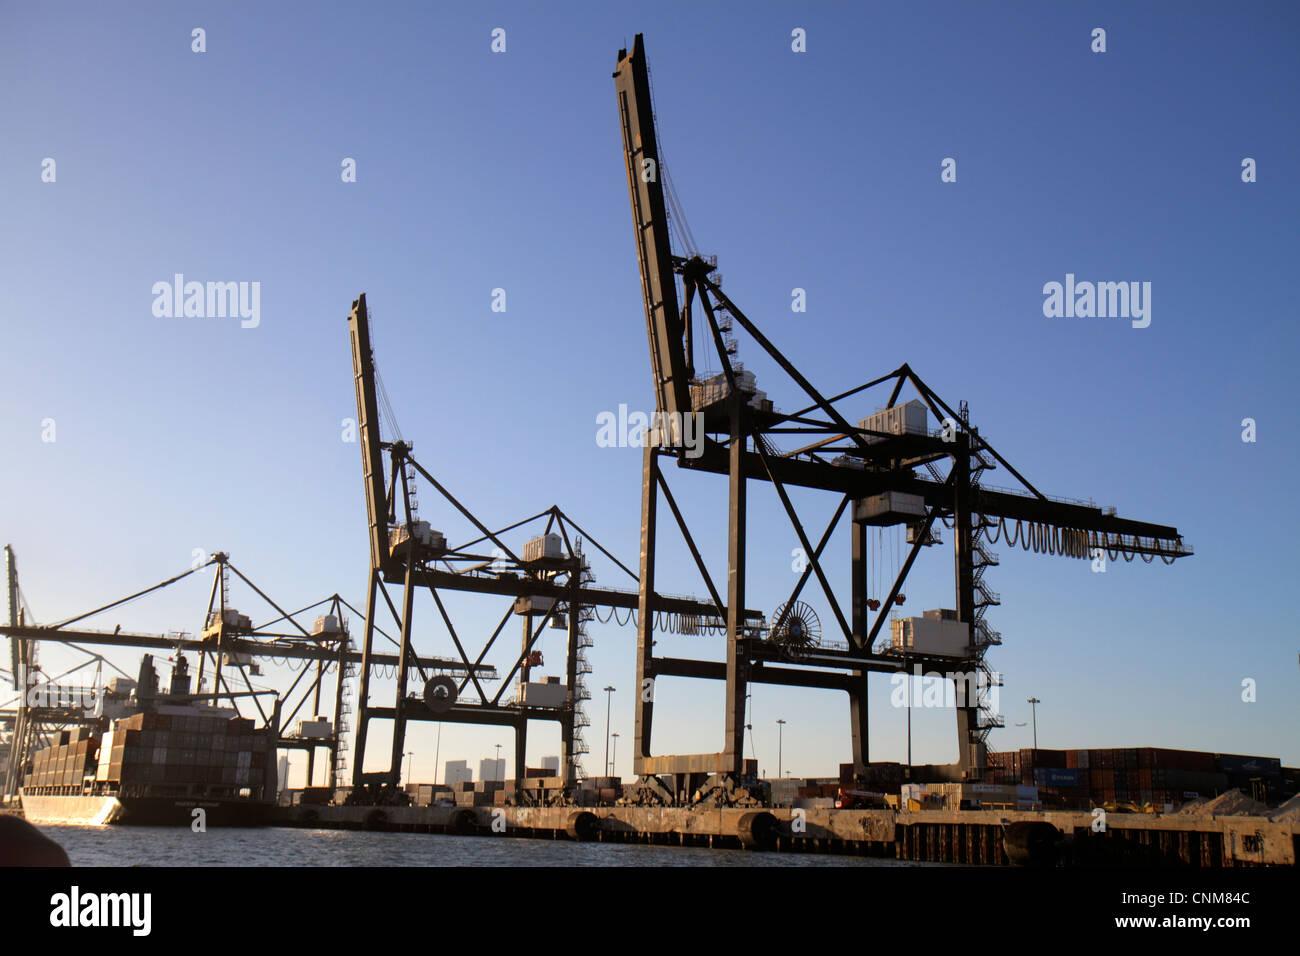 Miami Florida Biscayne Bay Dodge Insel Port of Miami Lastenaufzug Container Krane Schiff Stockfoto